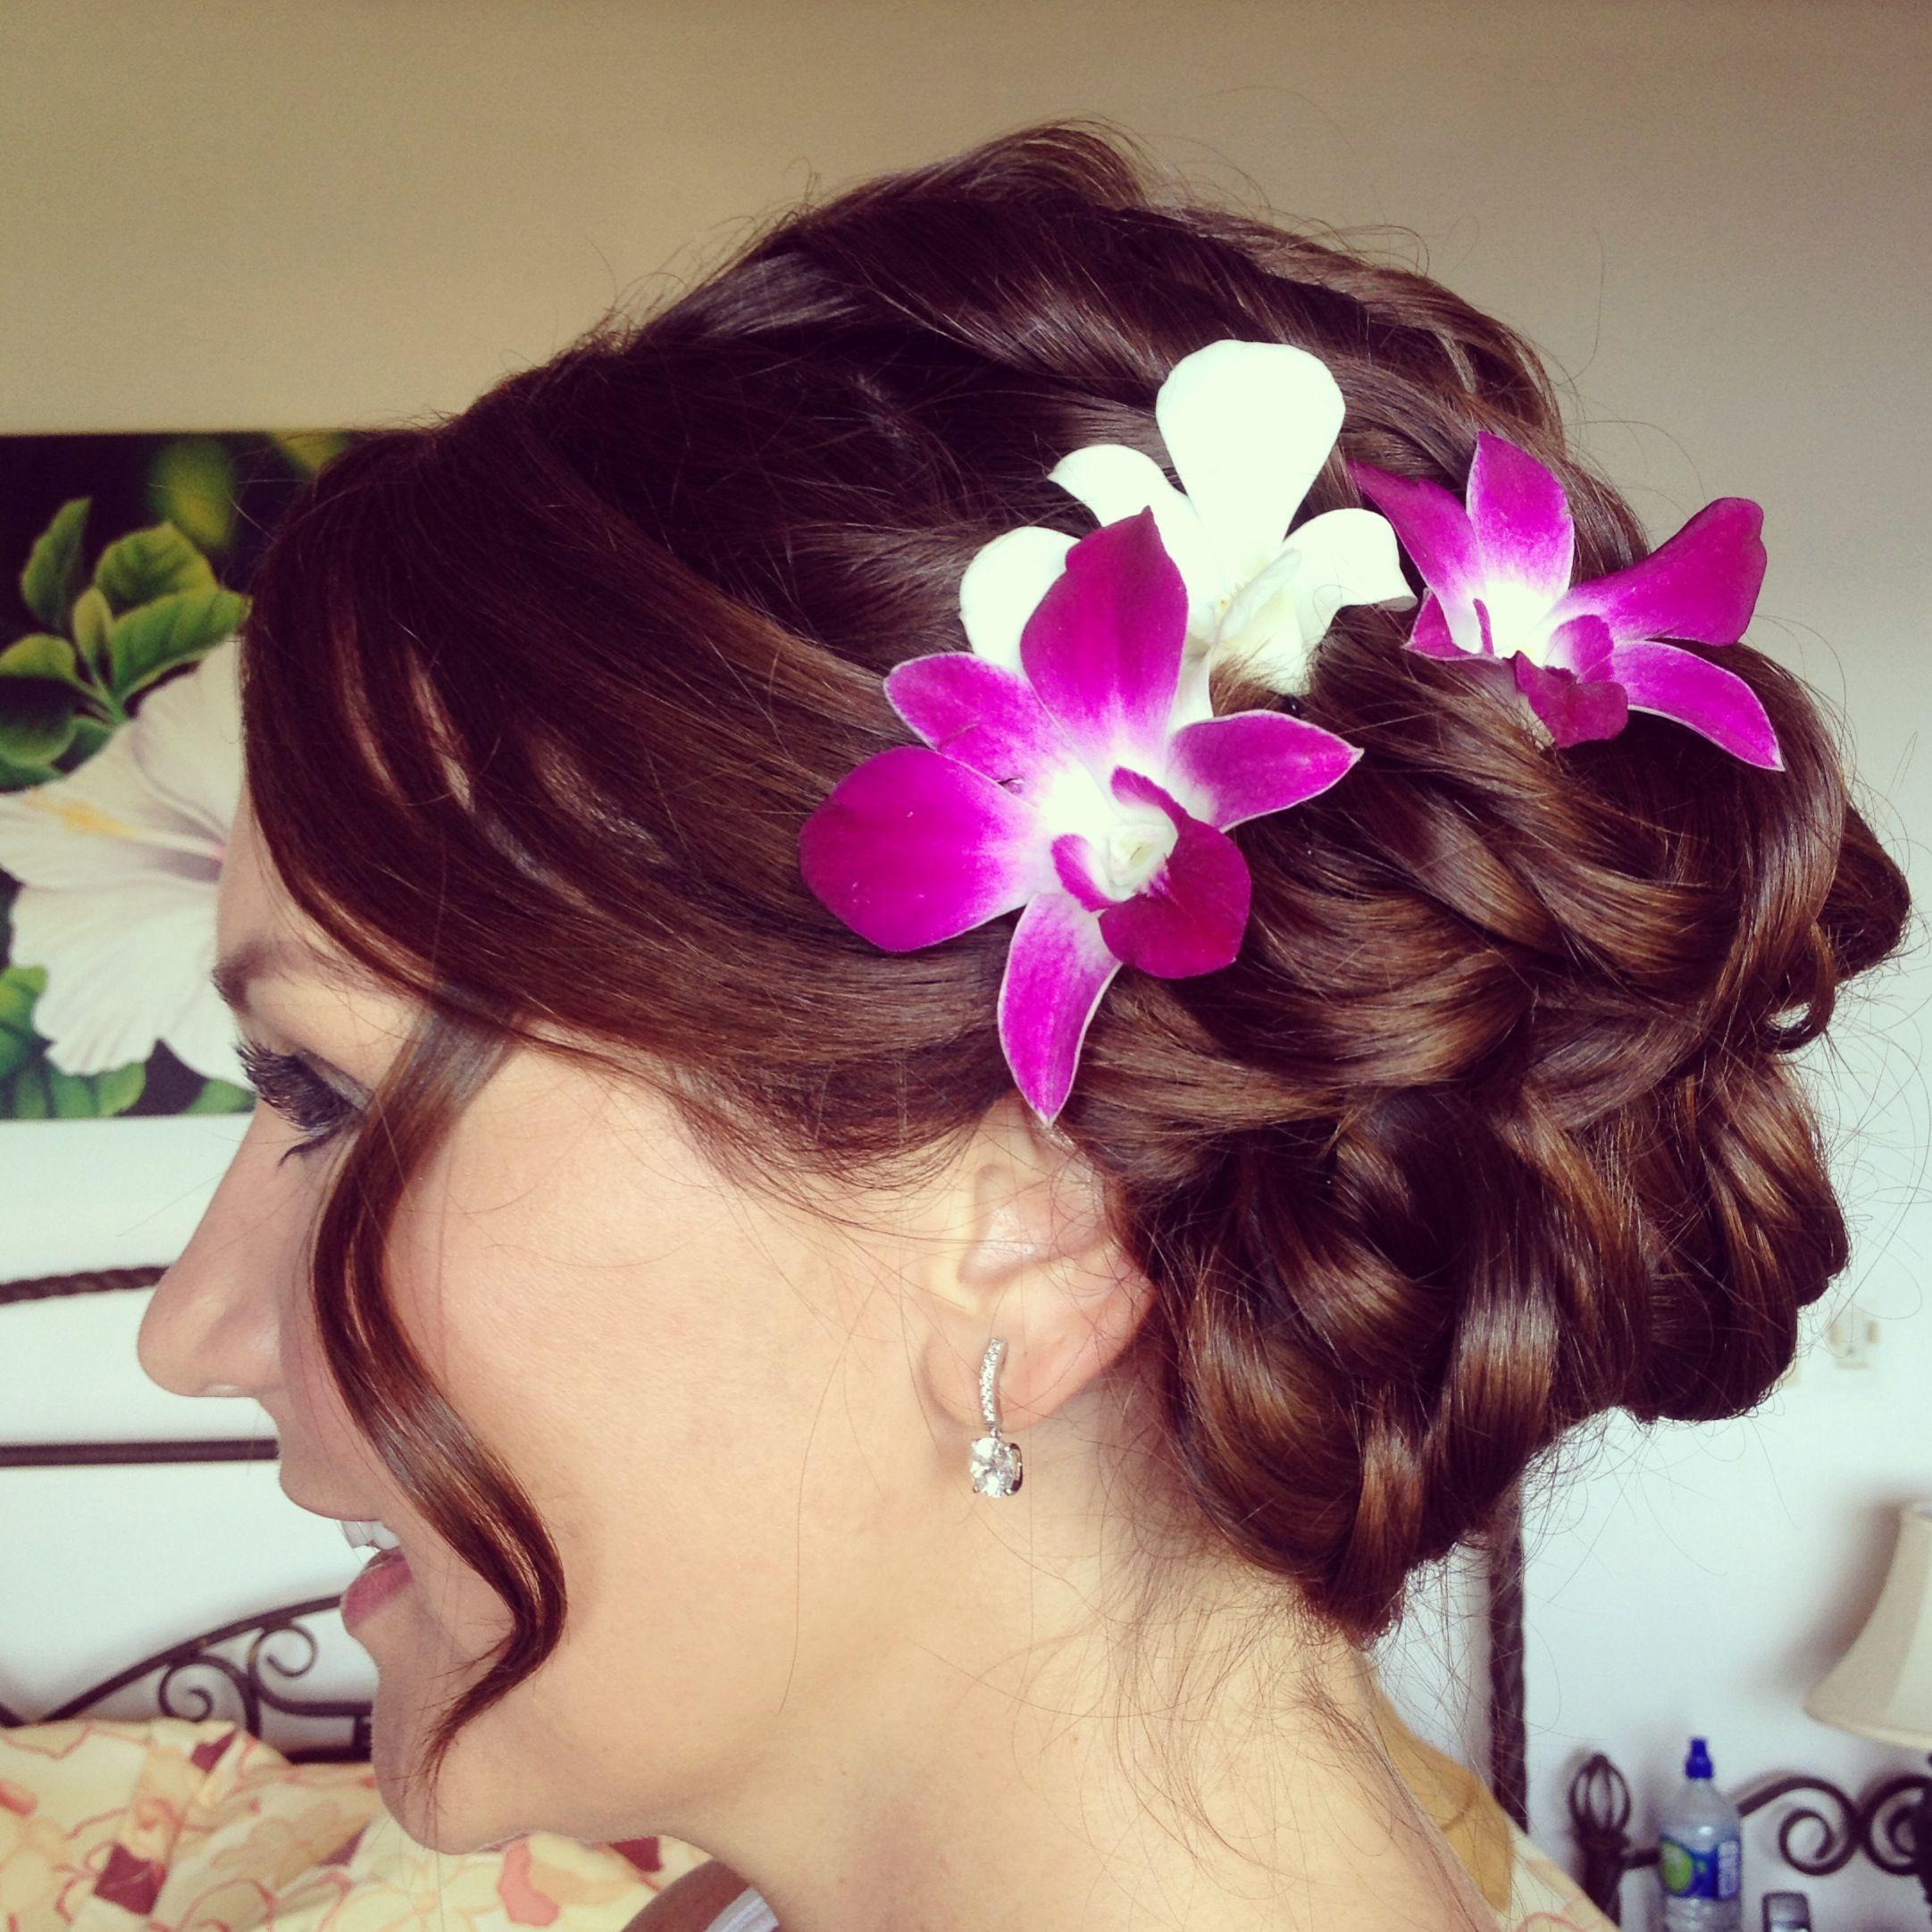 Hair And Makeup By Monica Beachy Updo Tropical Wedding Costa Rica Hair Makeup Wedding Hairstyles Her Hair